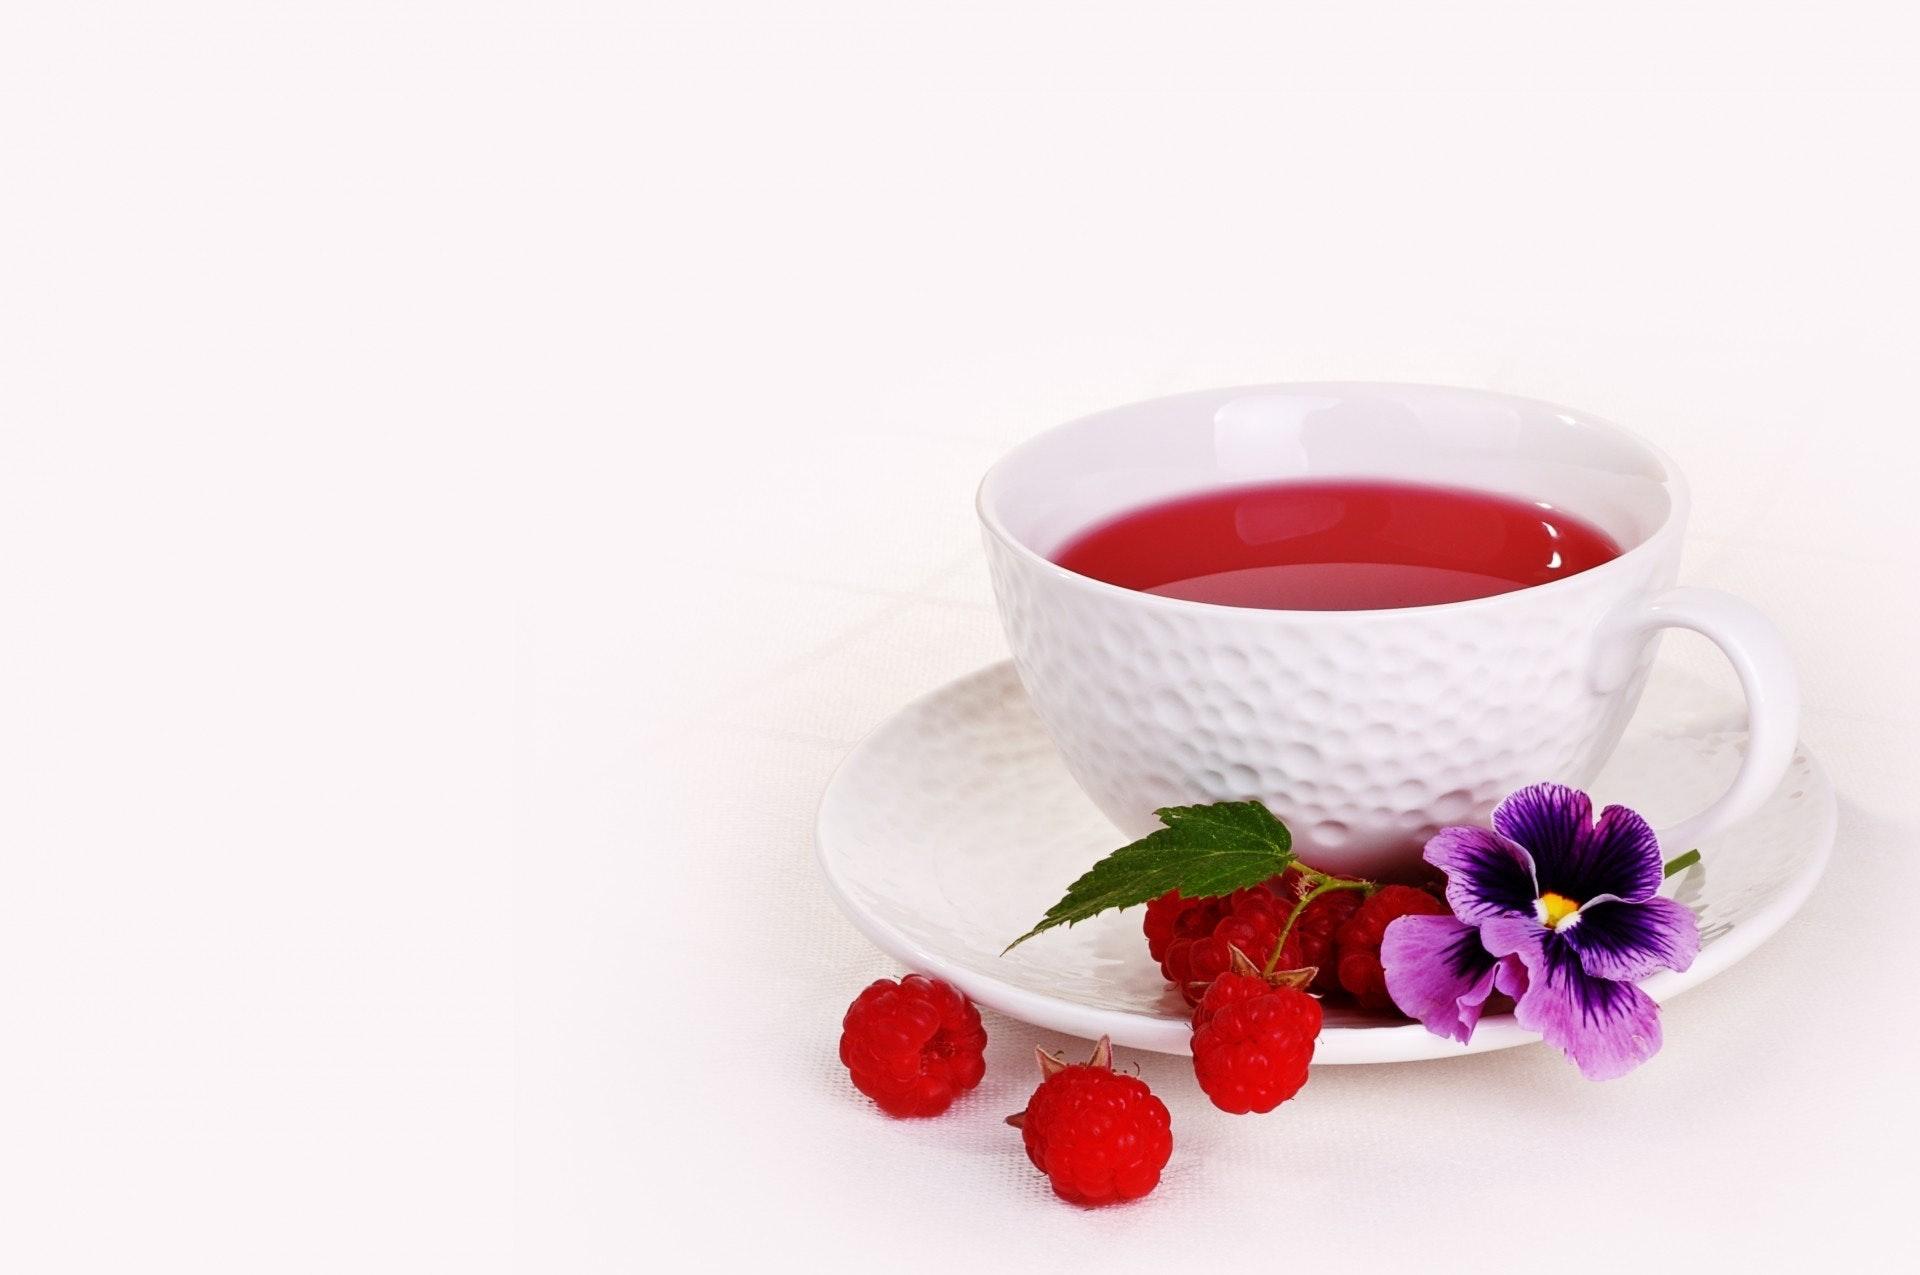 berry-beverage-ceramic-34780.jpg